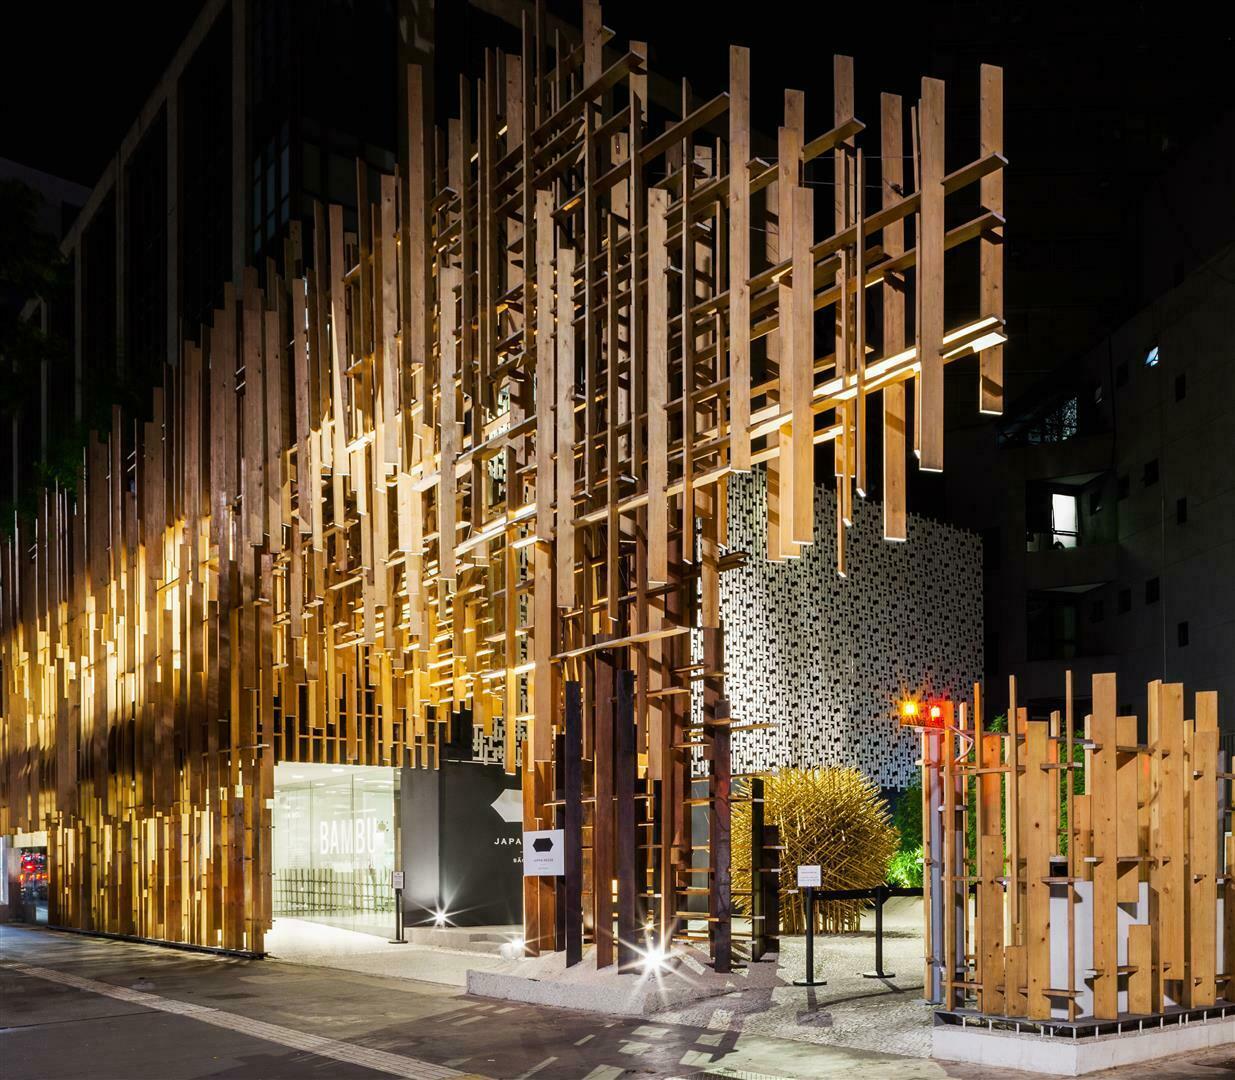 JAPAN HOUSE ARQUITETURA - Japan House recebe prêmio Prix Versailles